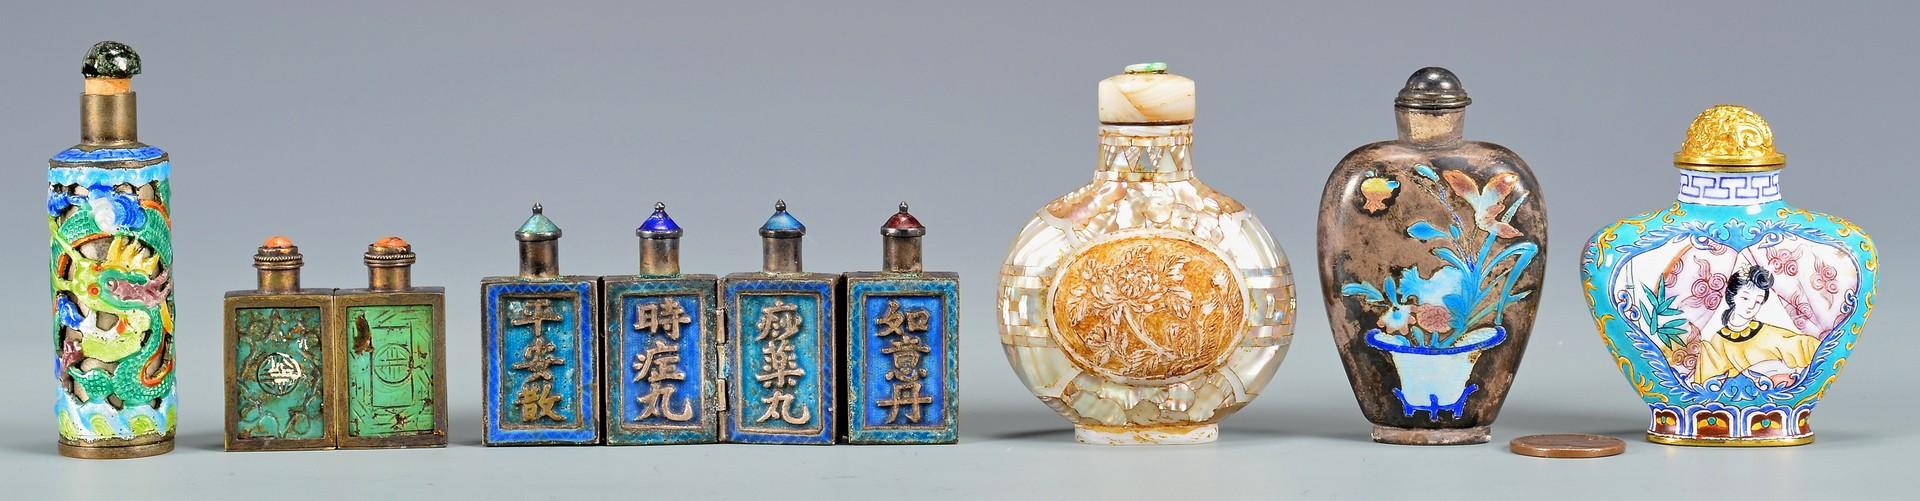 Lot 400: 6 Chinese Snuff Bottles, 5 Metal